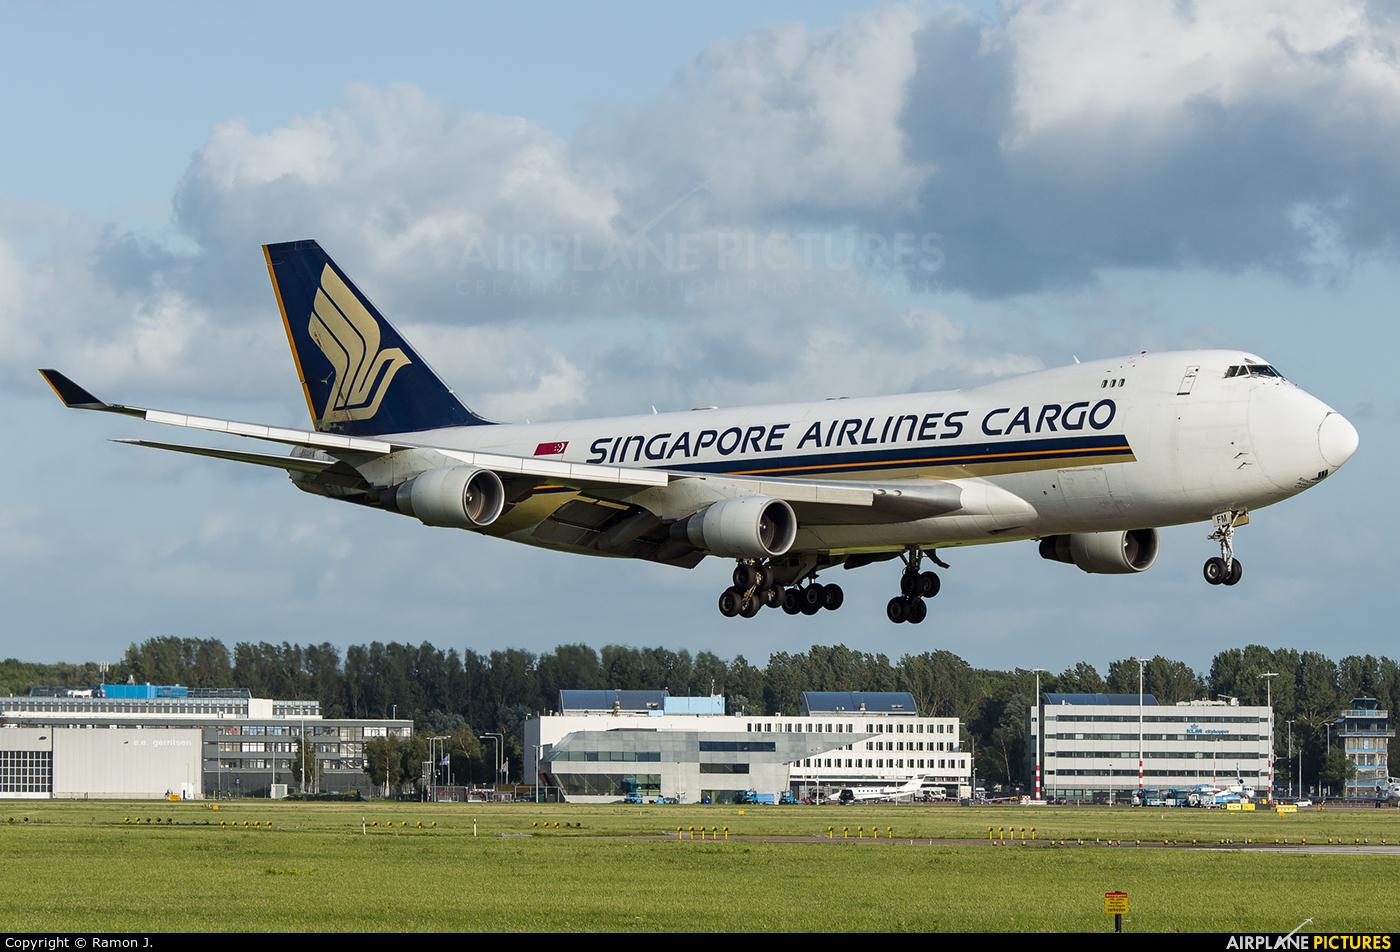 Singapore Airlines Cargo 9V-SFM aircraft at Amsterdam - Schiphol